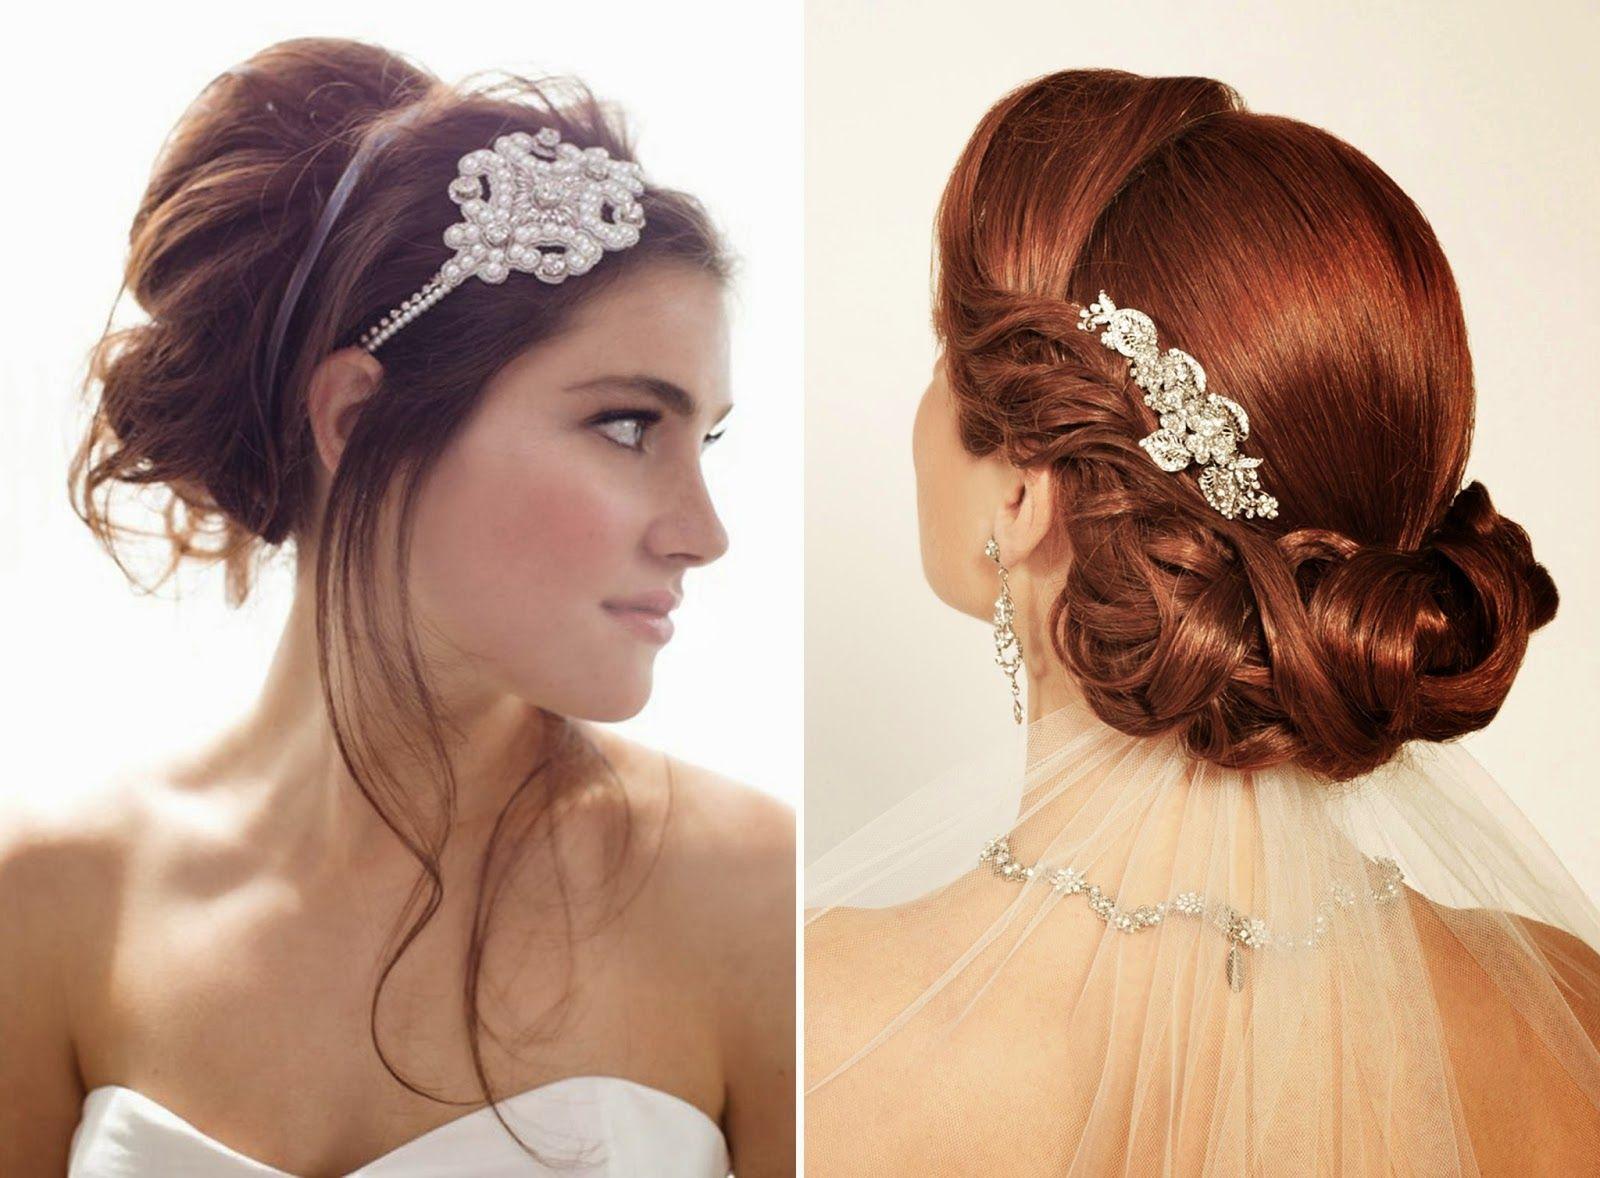 Long Hair Styling Tips: Peinado De Novia!! Guapísima En La Boda, Cabello Corto